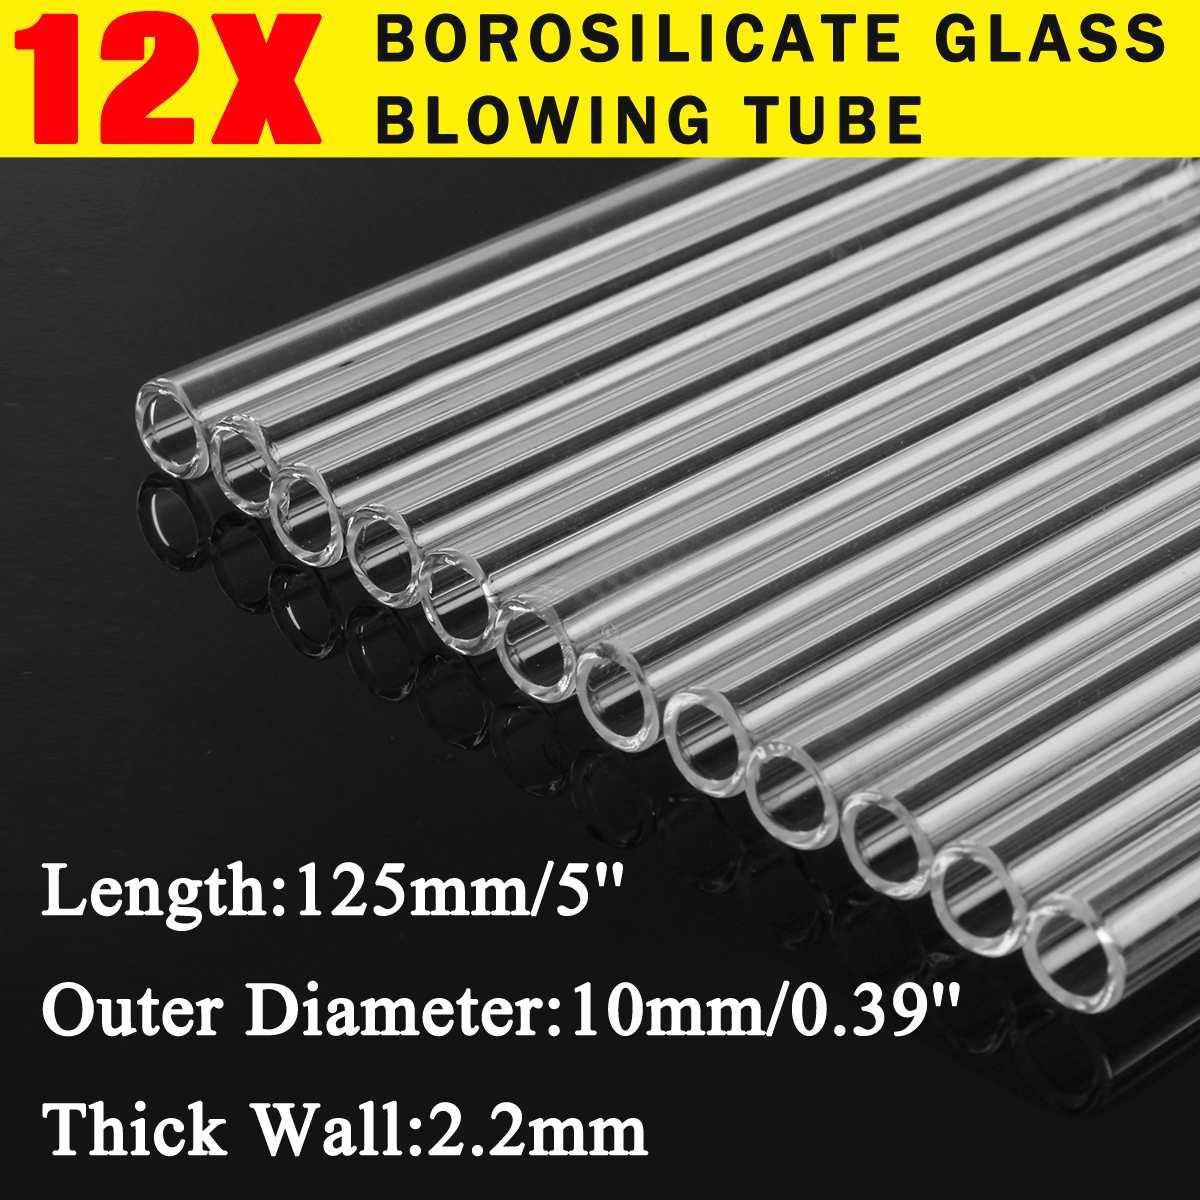 12pçs, borosilicate de parede de vidro tubo de sopro, haste de vidro, ferramentas de misturador de escola de laboratório 125mm OD-10mm mm wholesales